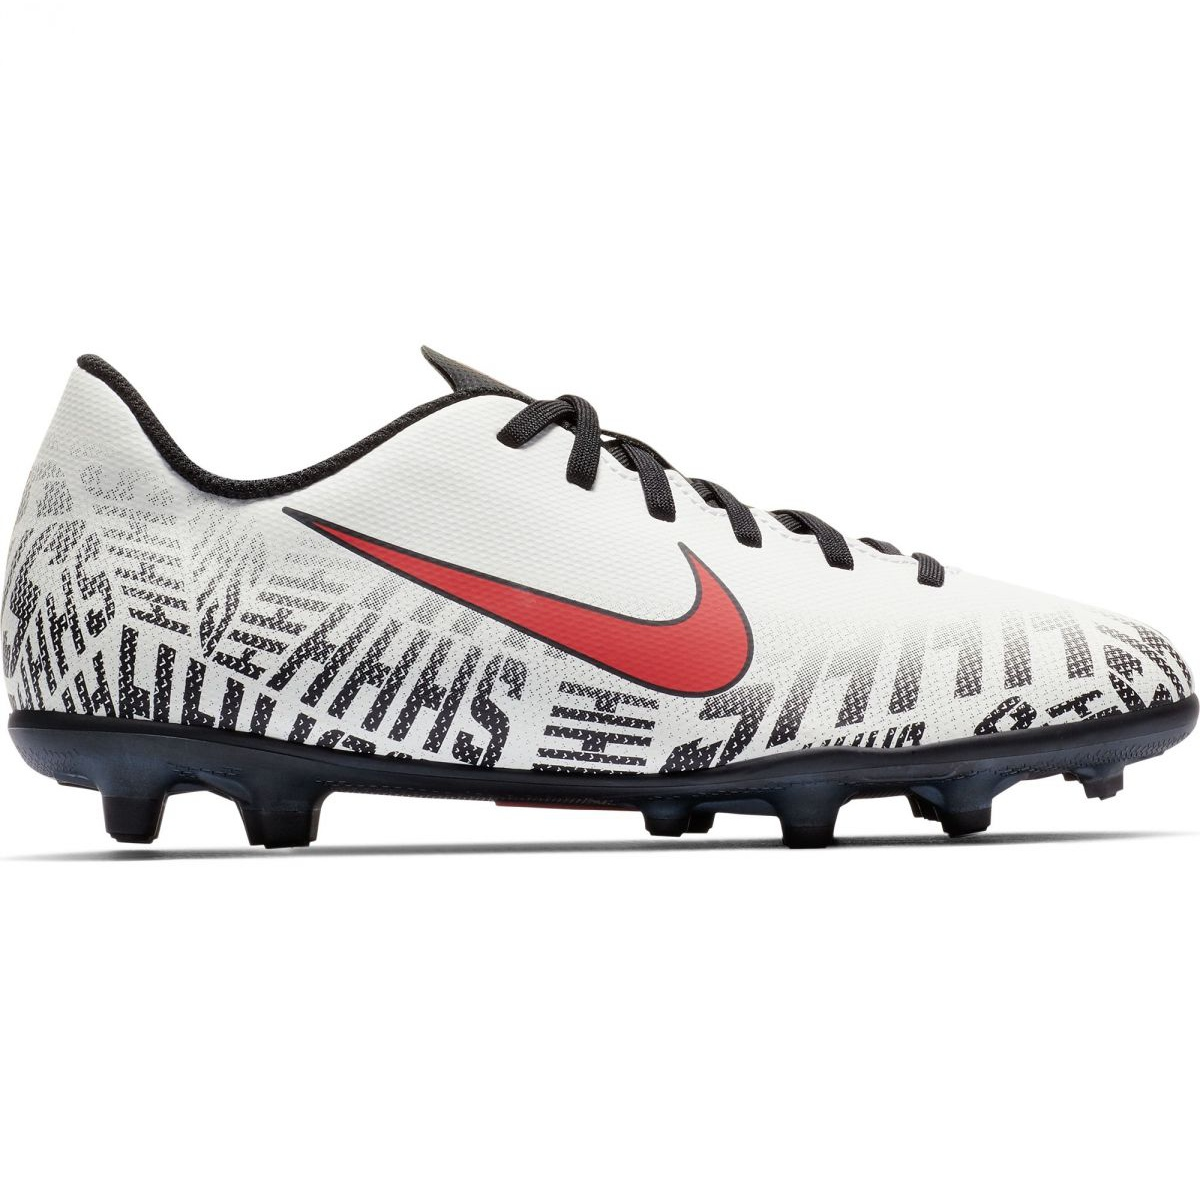 the latest ececf ce2ef Mercurial Nike Neymar Vapor 12 Club Fg Jr. AV4762-170 Football Shoes